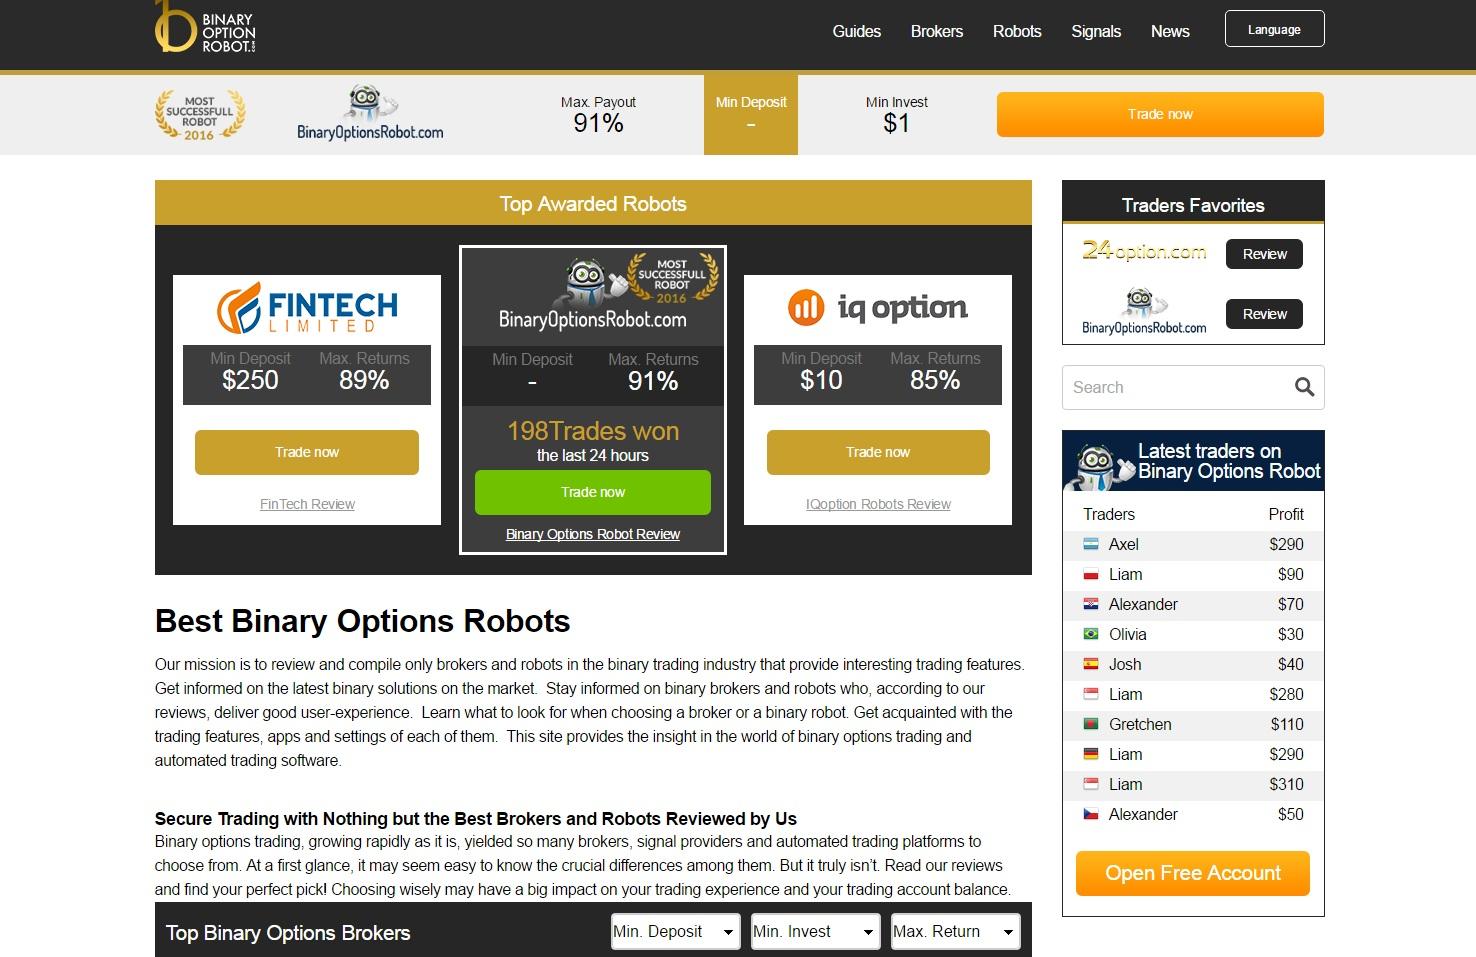 Tranzacționare opțiuni binare | Dukascopy Bank, opțiuni binare site-uri de tranzacționare